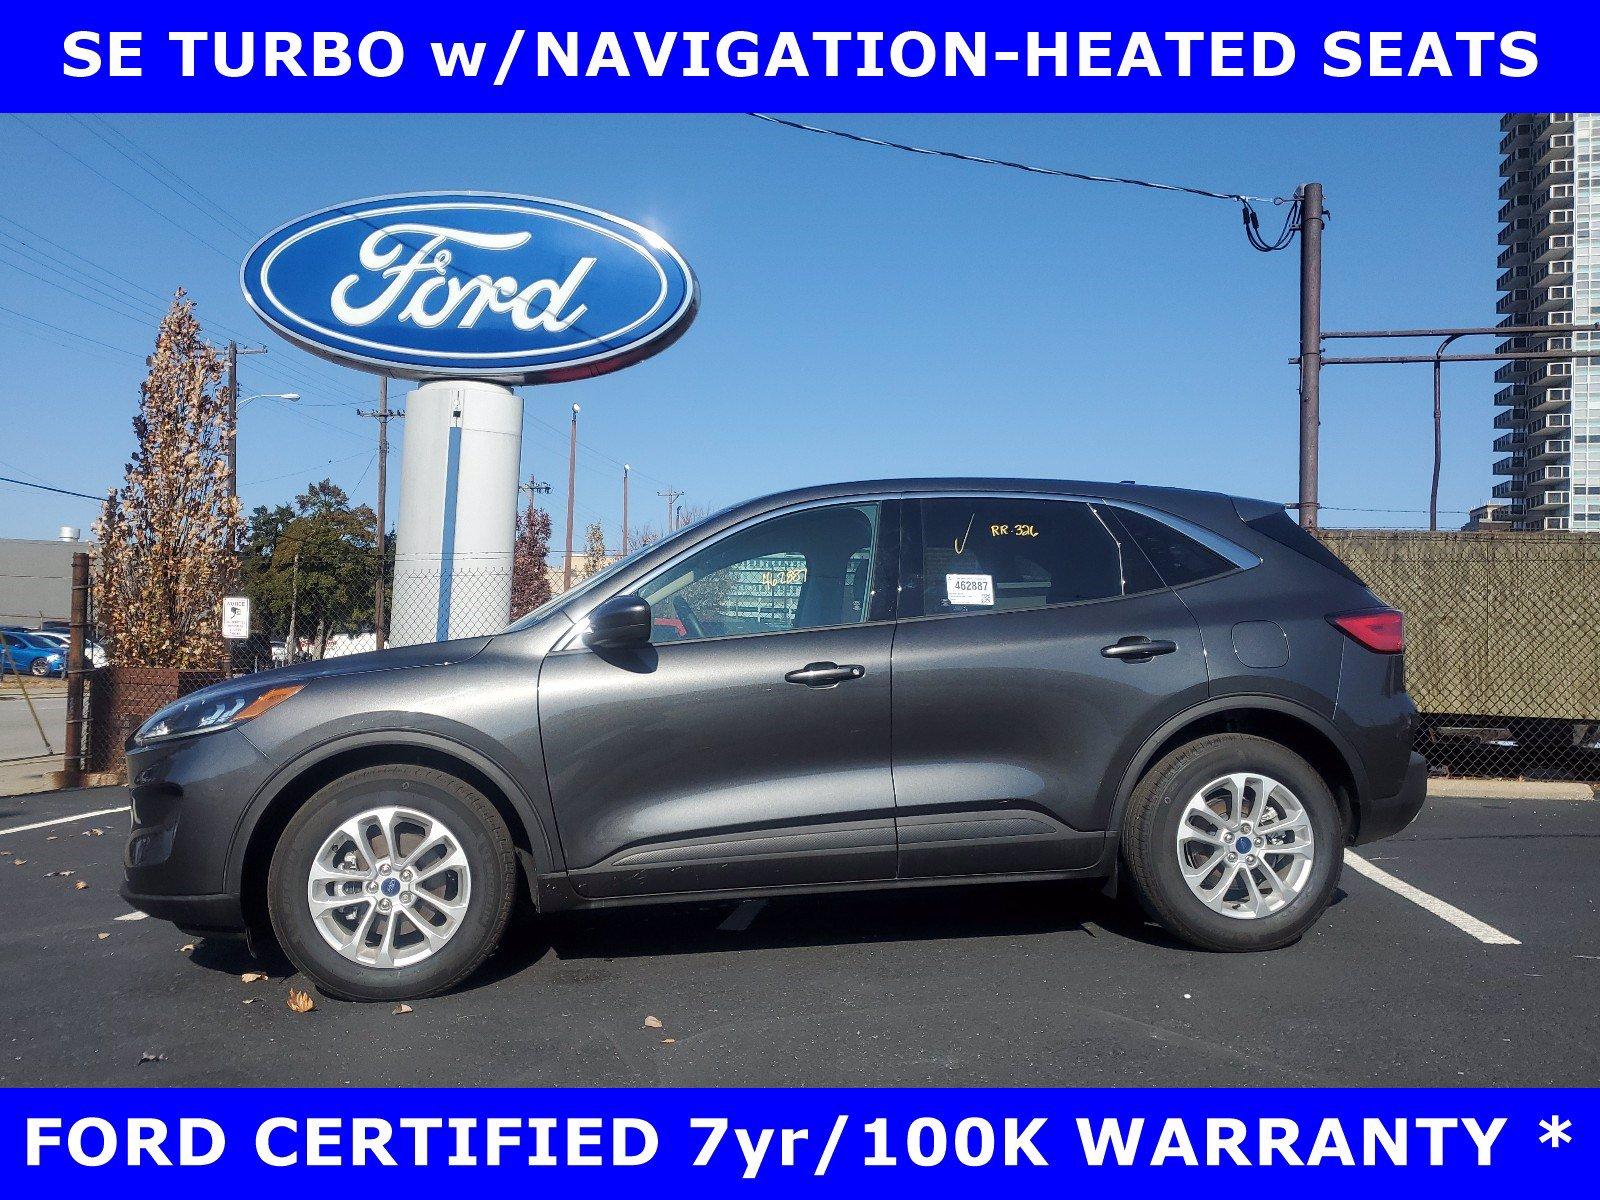 2020 Ford Escape SE TURBO w/NAVIGATION-Htd SEATS SUV